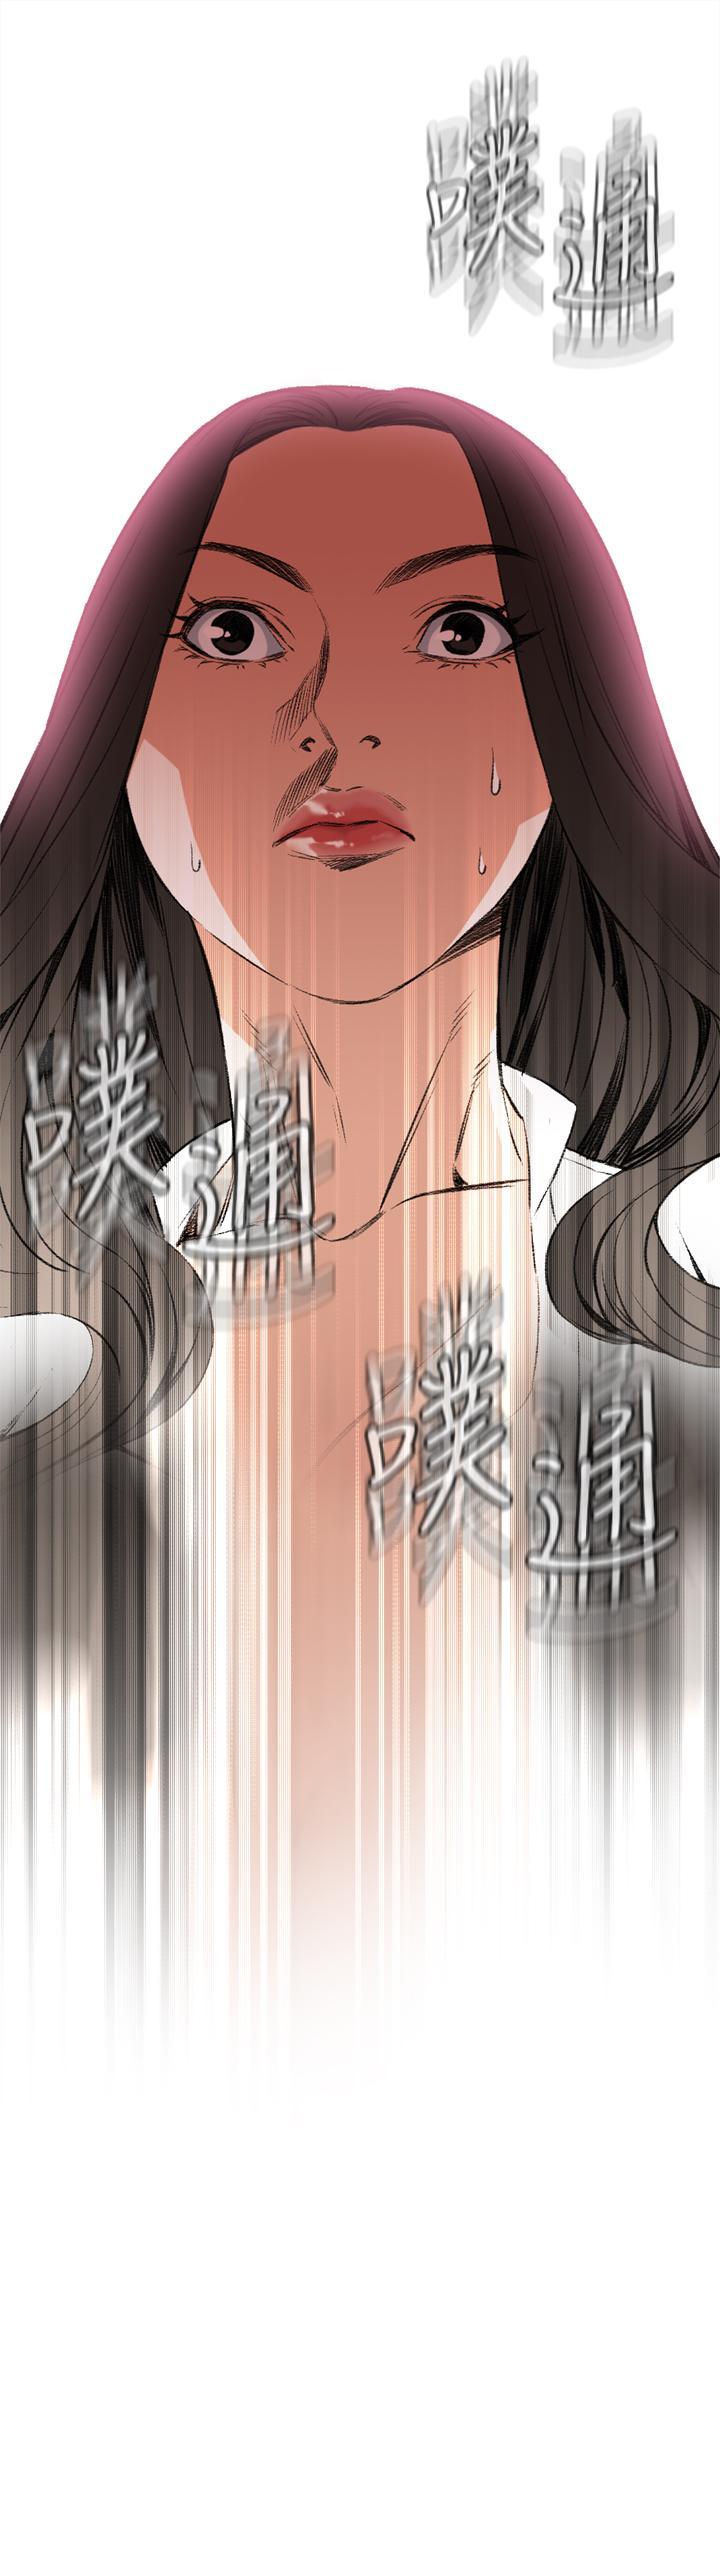 Take a Peek 偷窥 Ch.39~55 [Chinese]中文 256